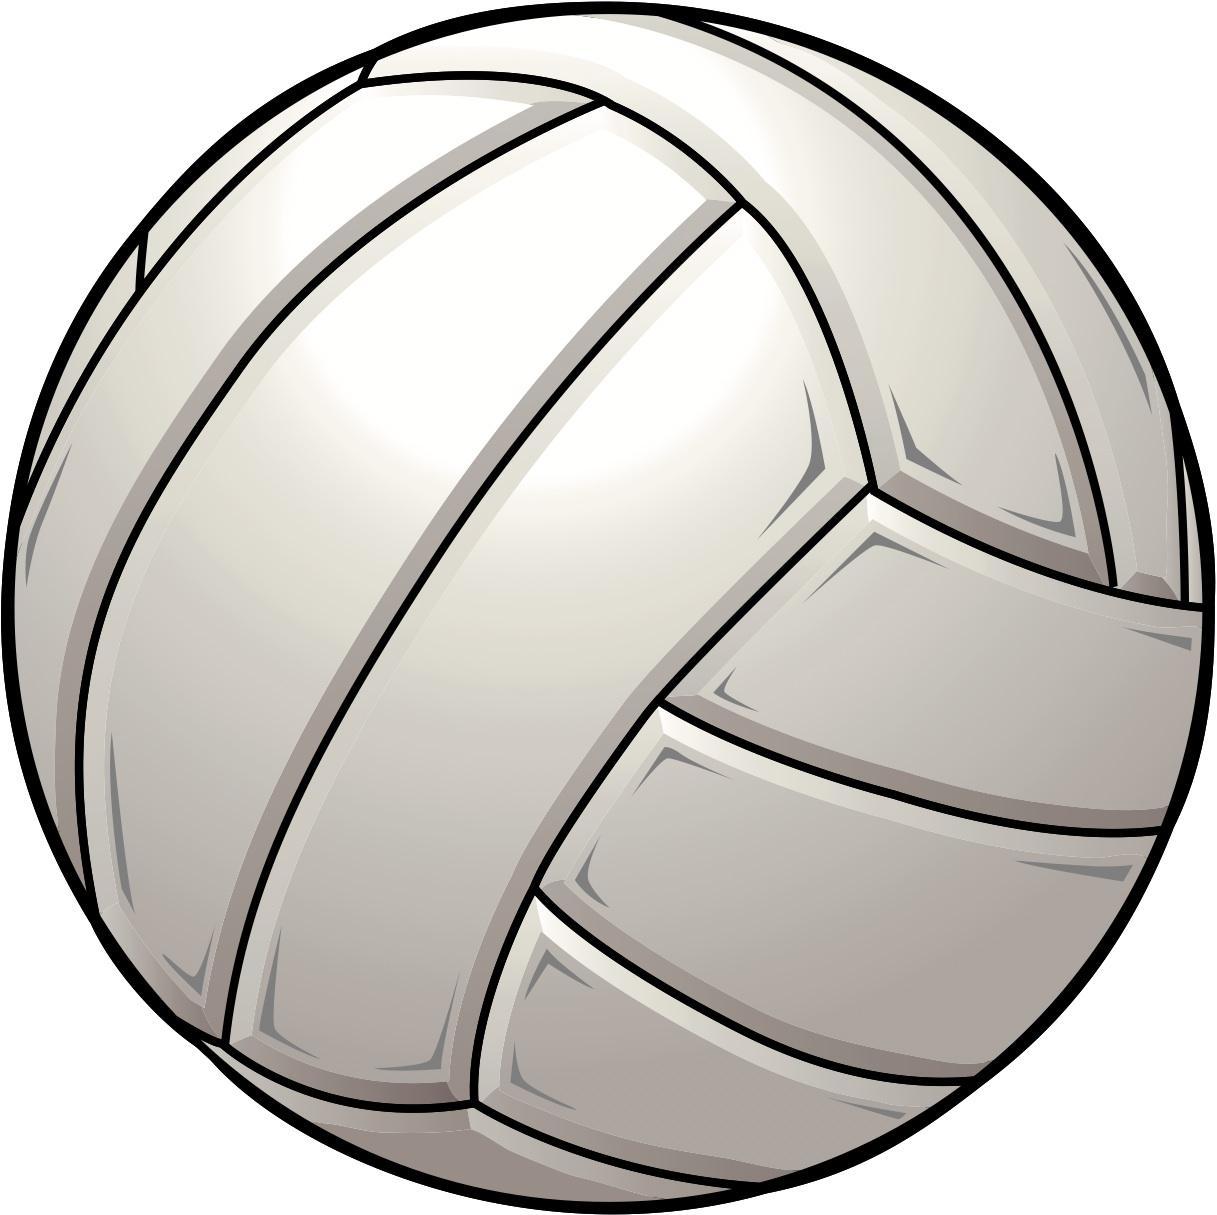 1217x1215 Best Volleyball Clipart